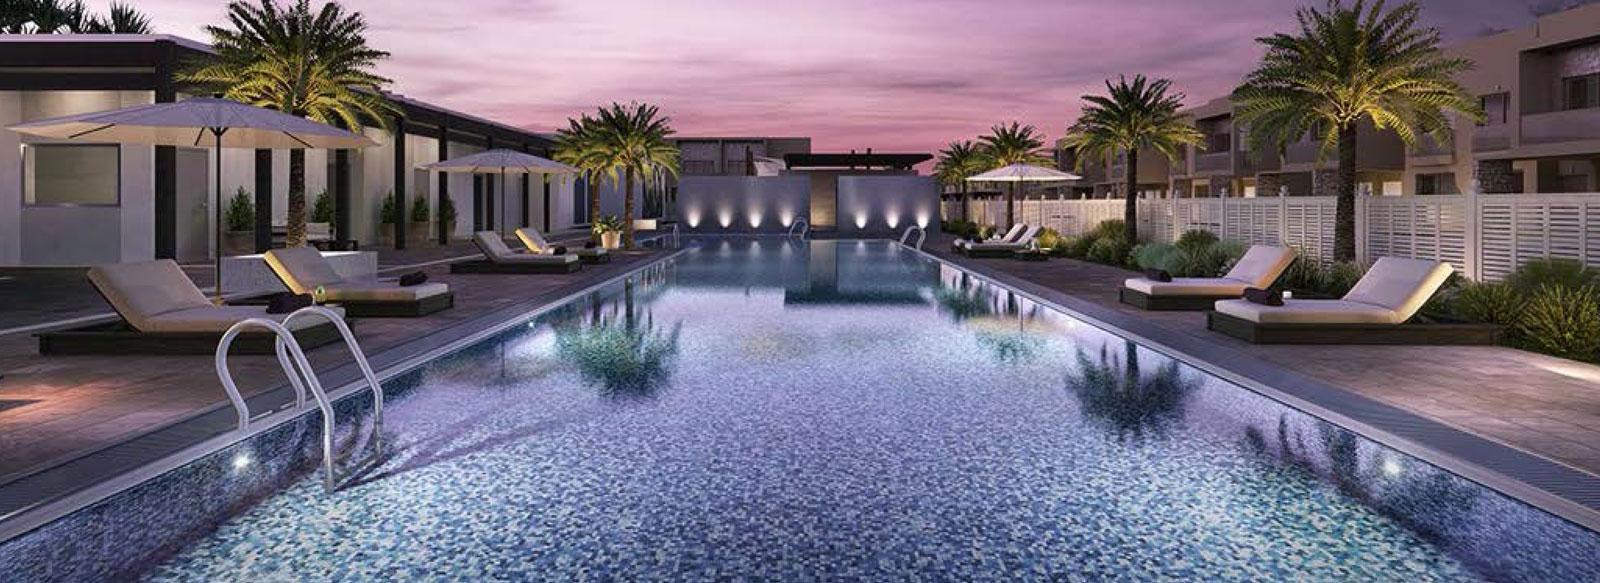 Luxury 4, 5 & 6 Bedroom Villas